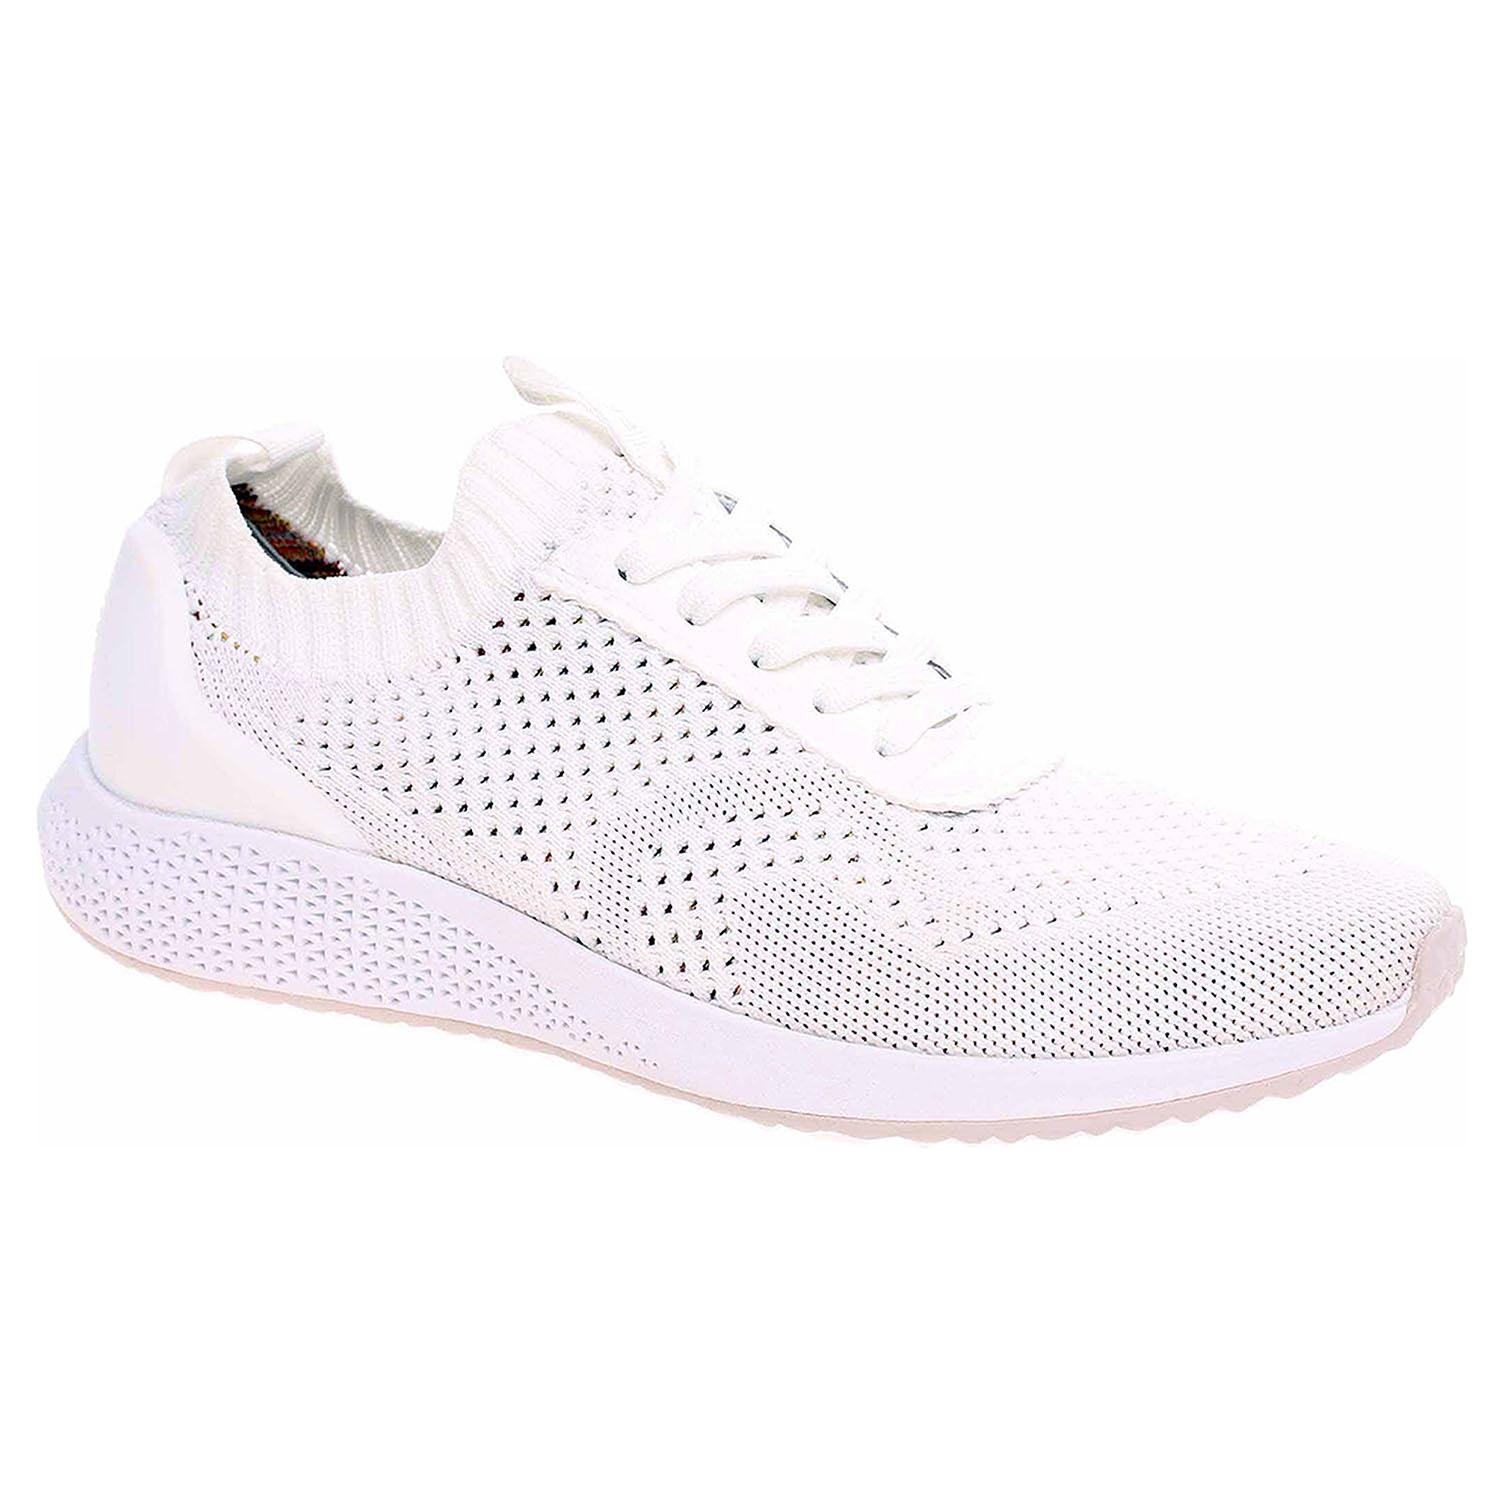 Dámská obuv Tamaris 1-23714-22 white 1-1-23714-22 925 39